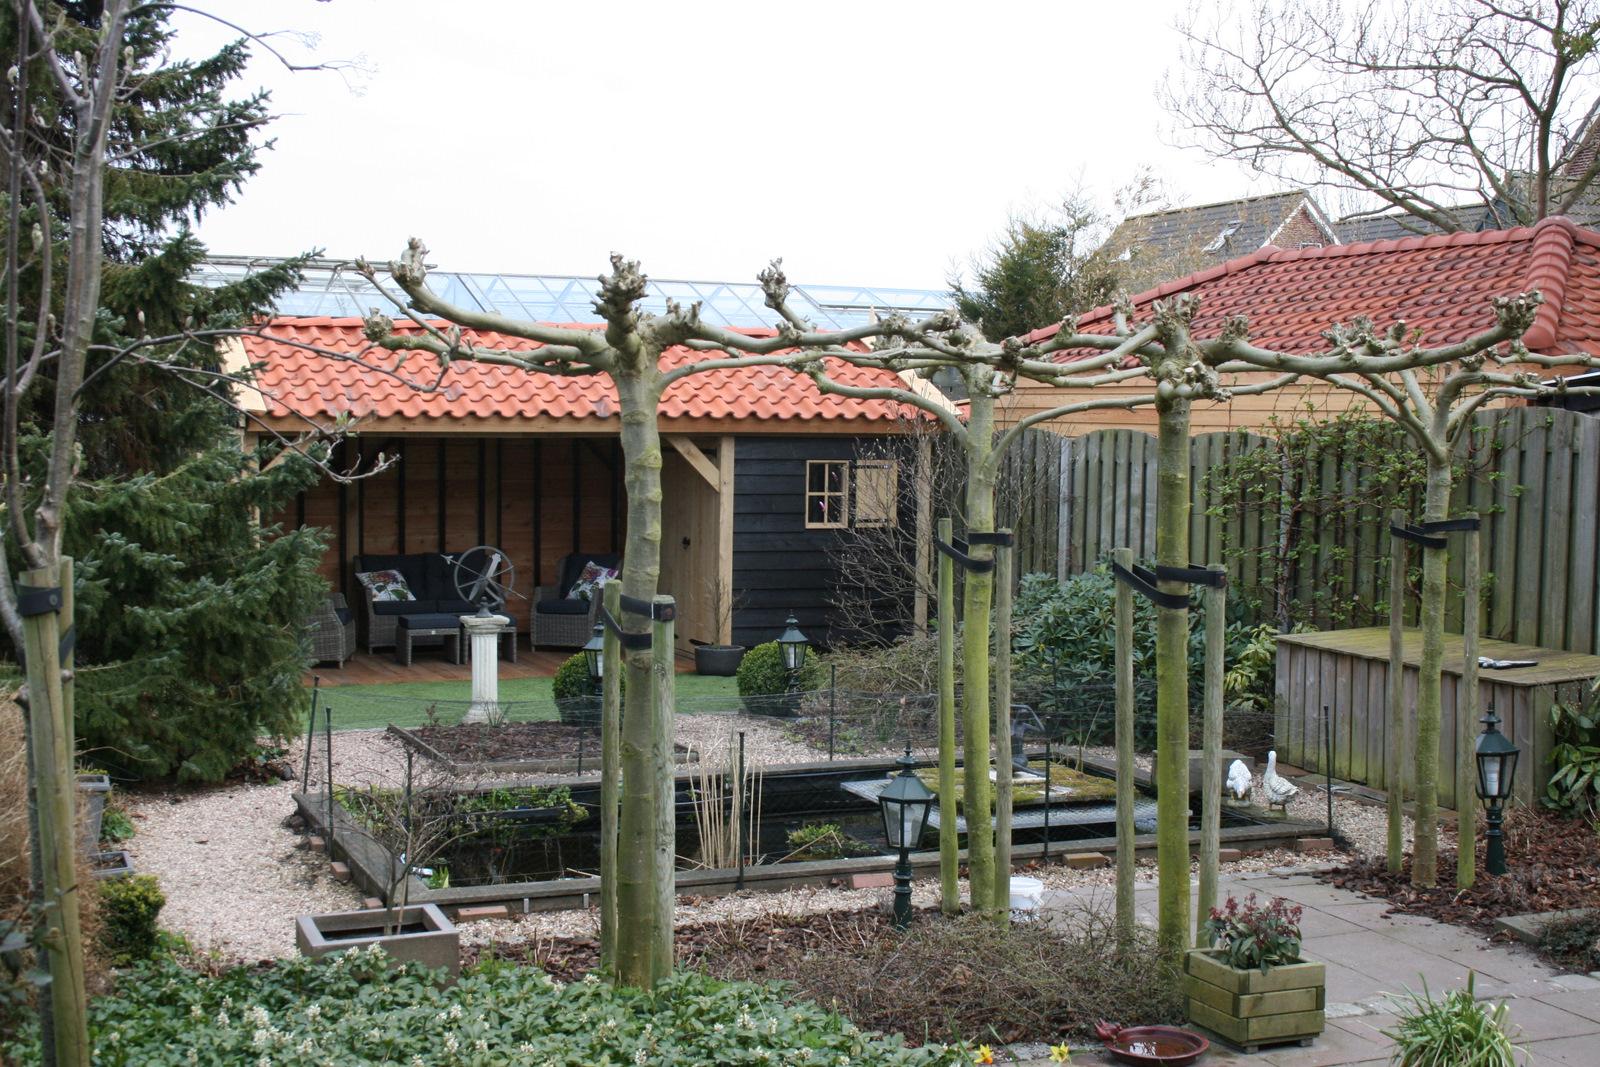 houten-tuinkamer-1 - Tuinhuis met tuinkamer